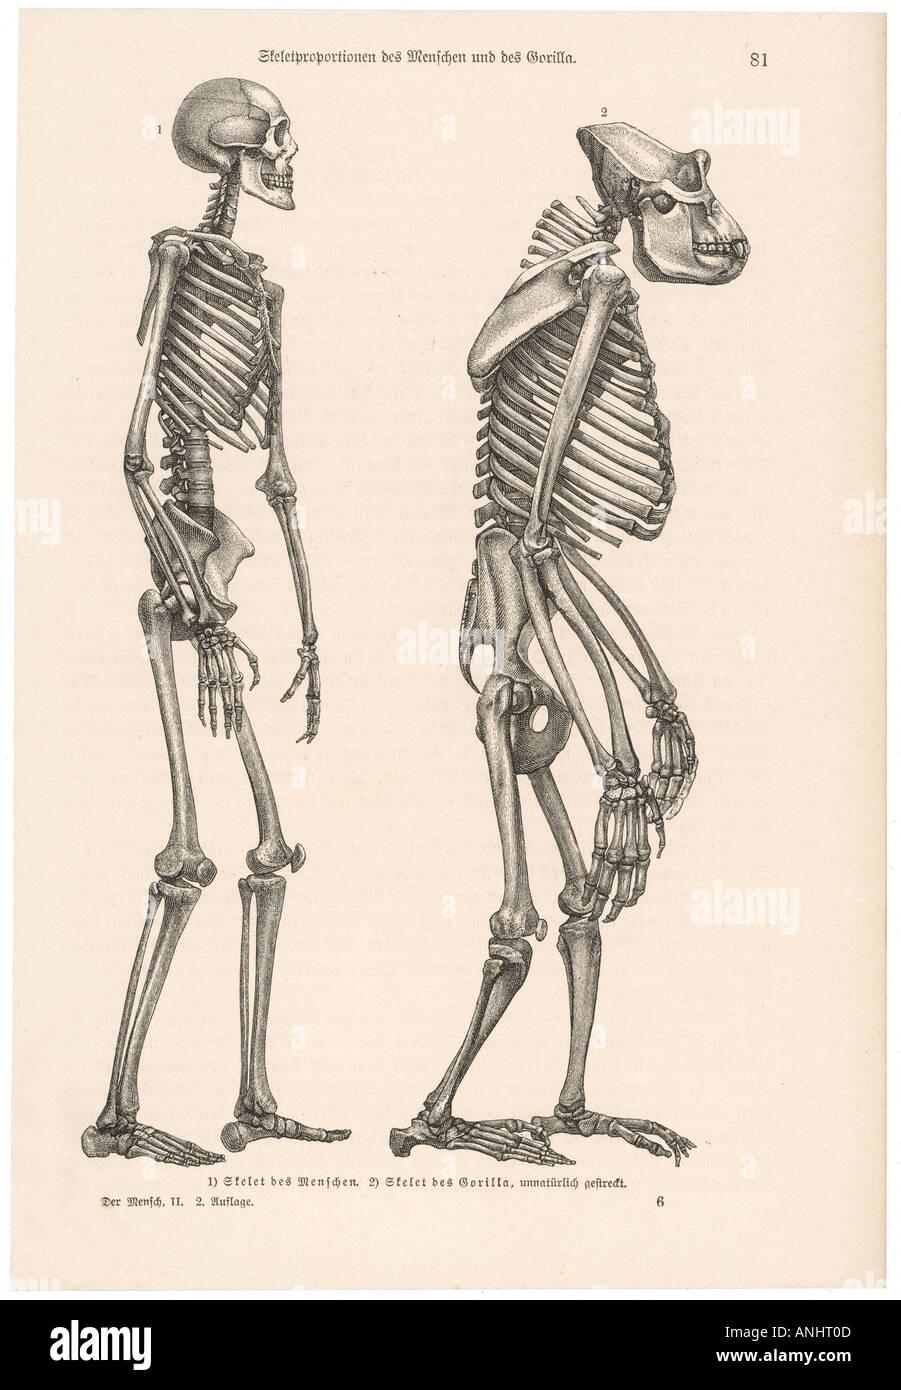 Ganzen Körper Anatomie Stockfoto, Bild: 5071884 - Alamy